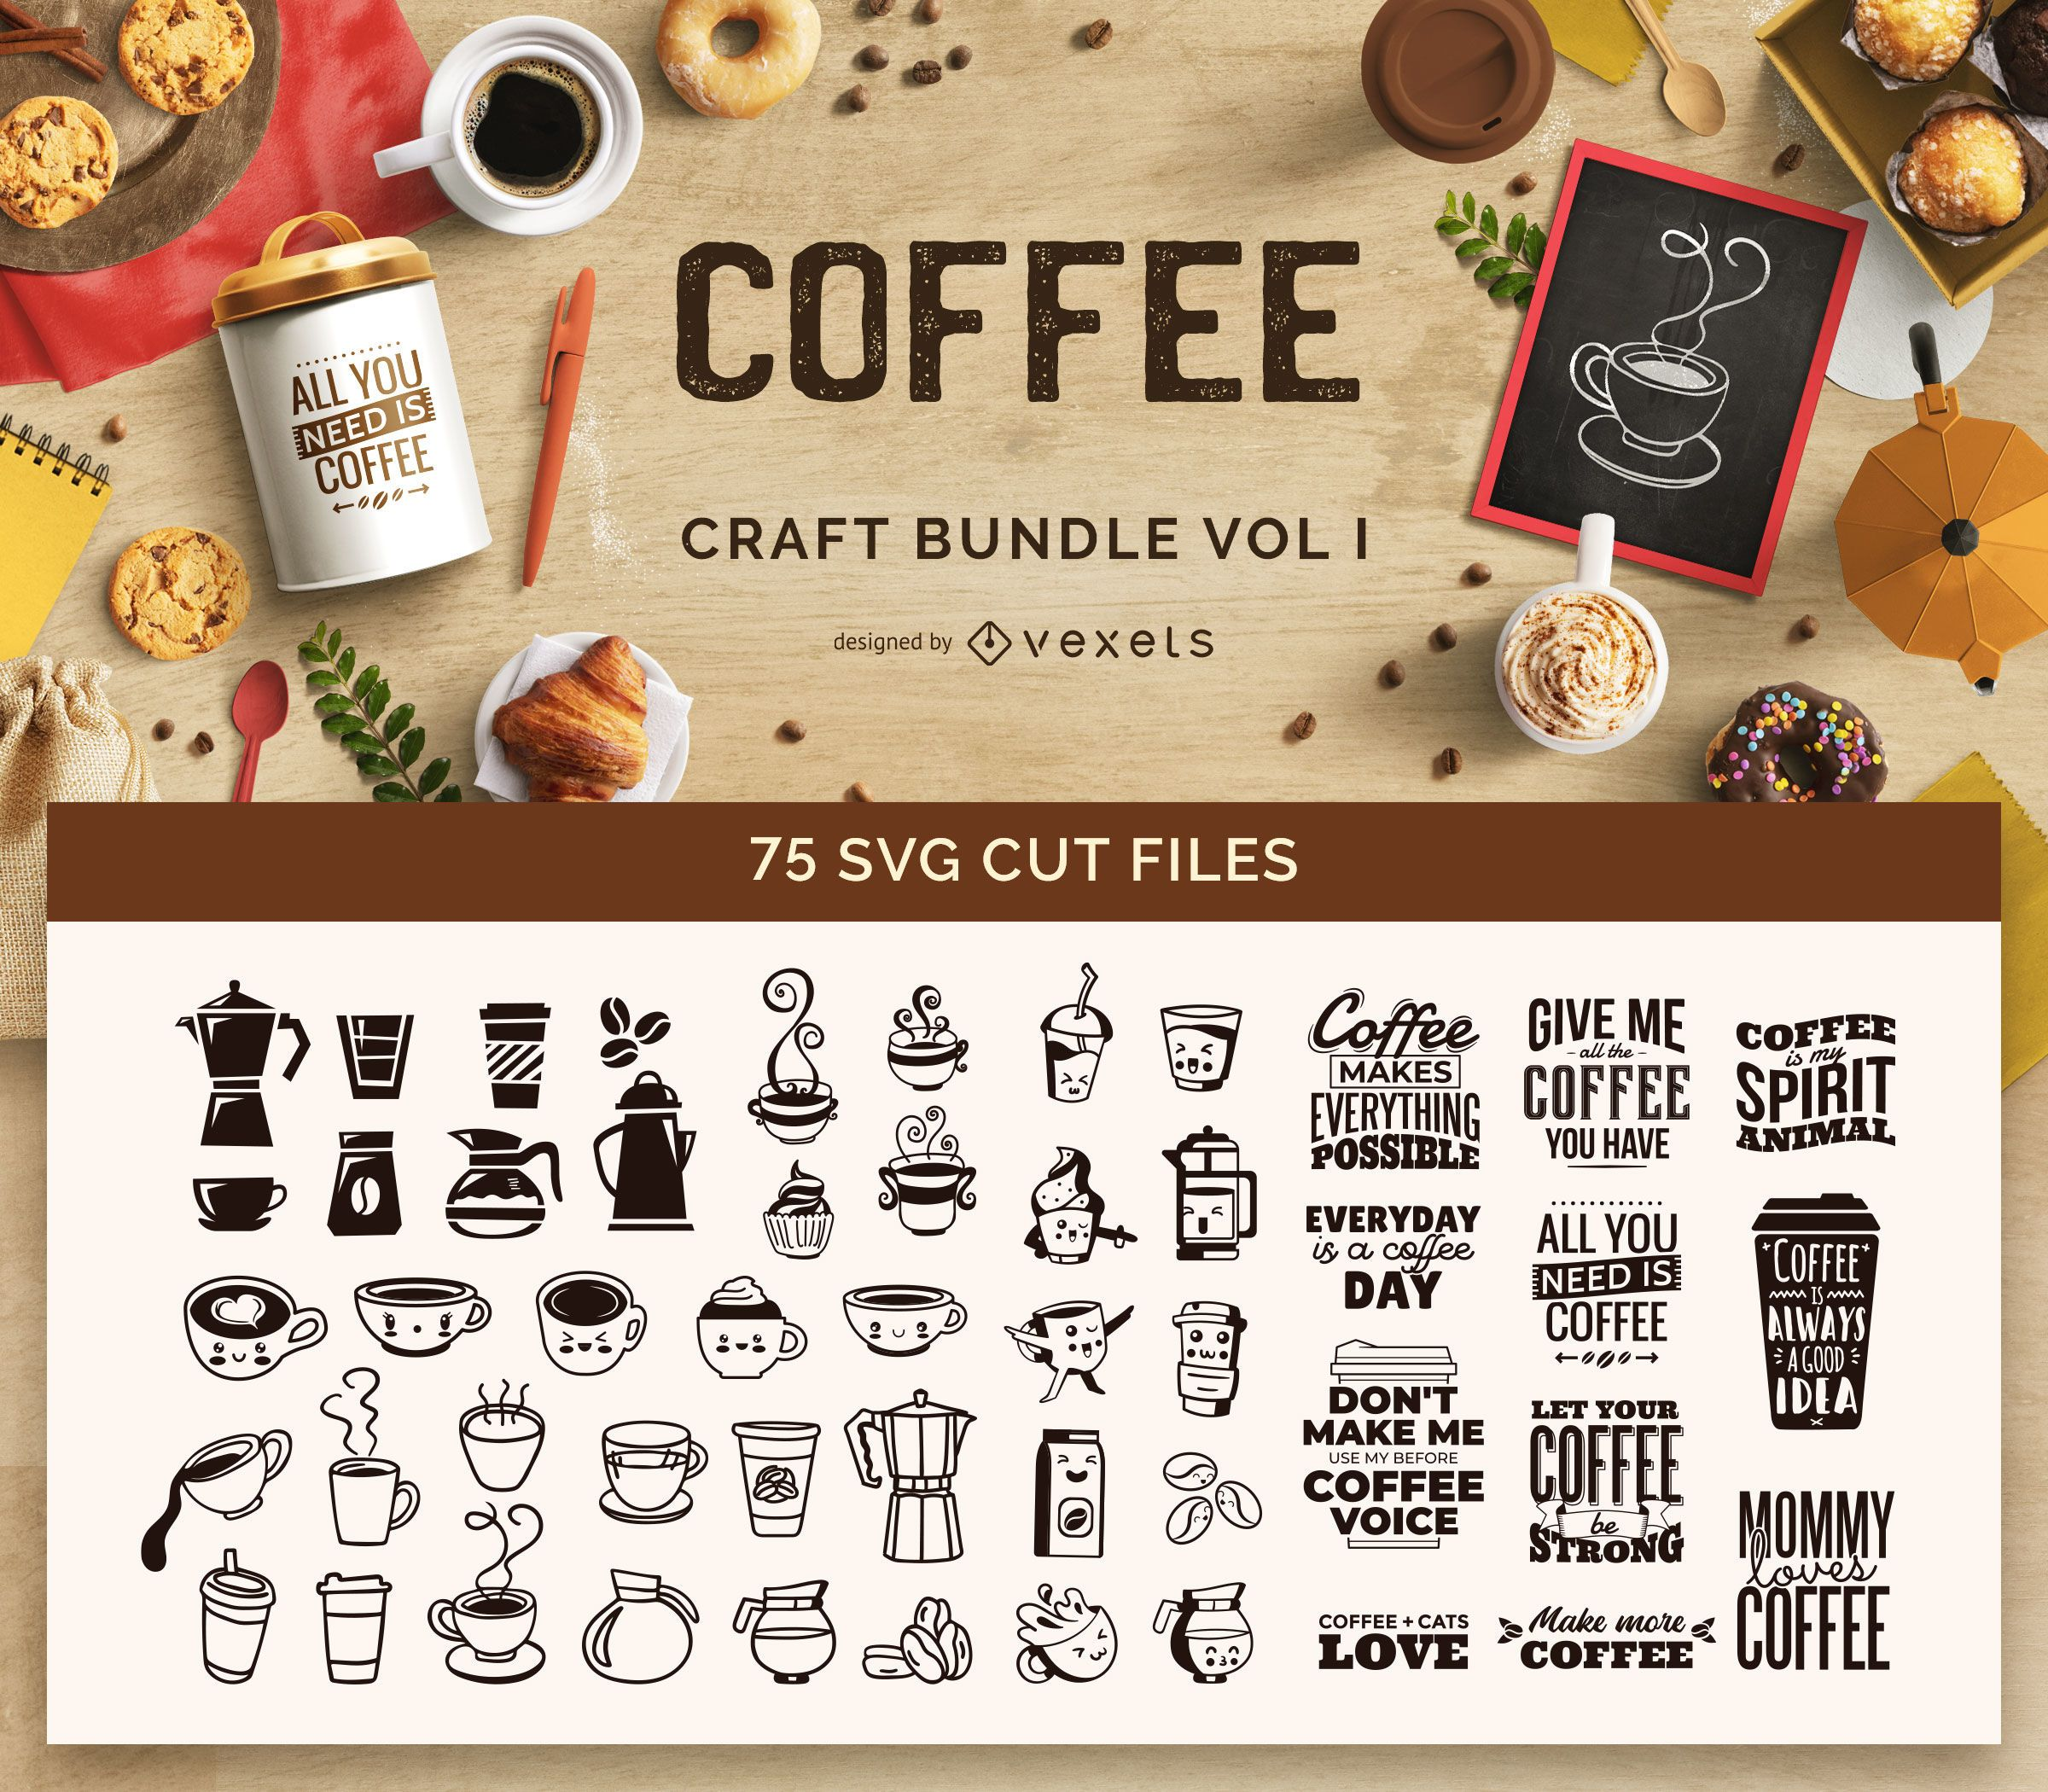 Paquete de manualidades de café Vol I